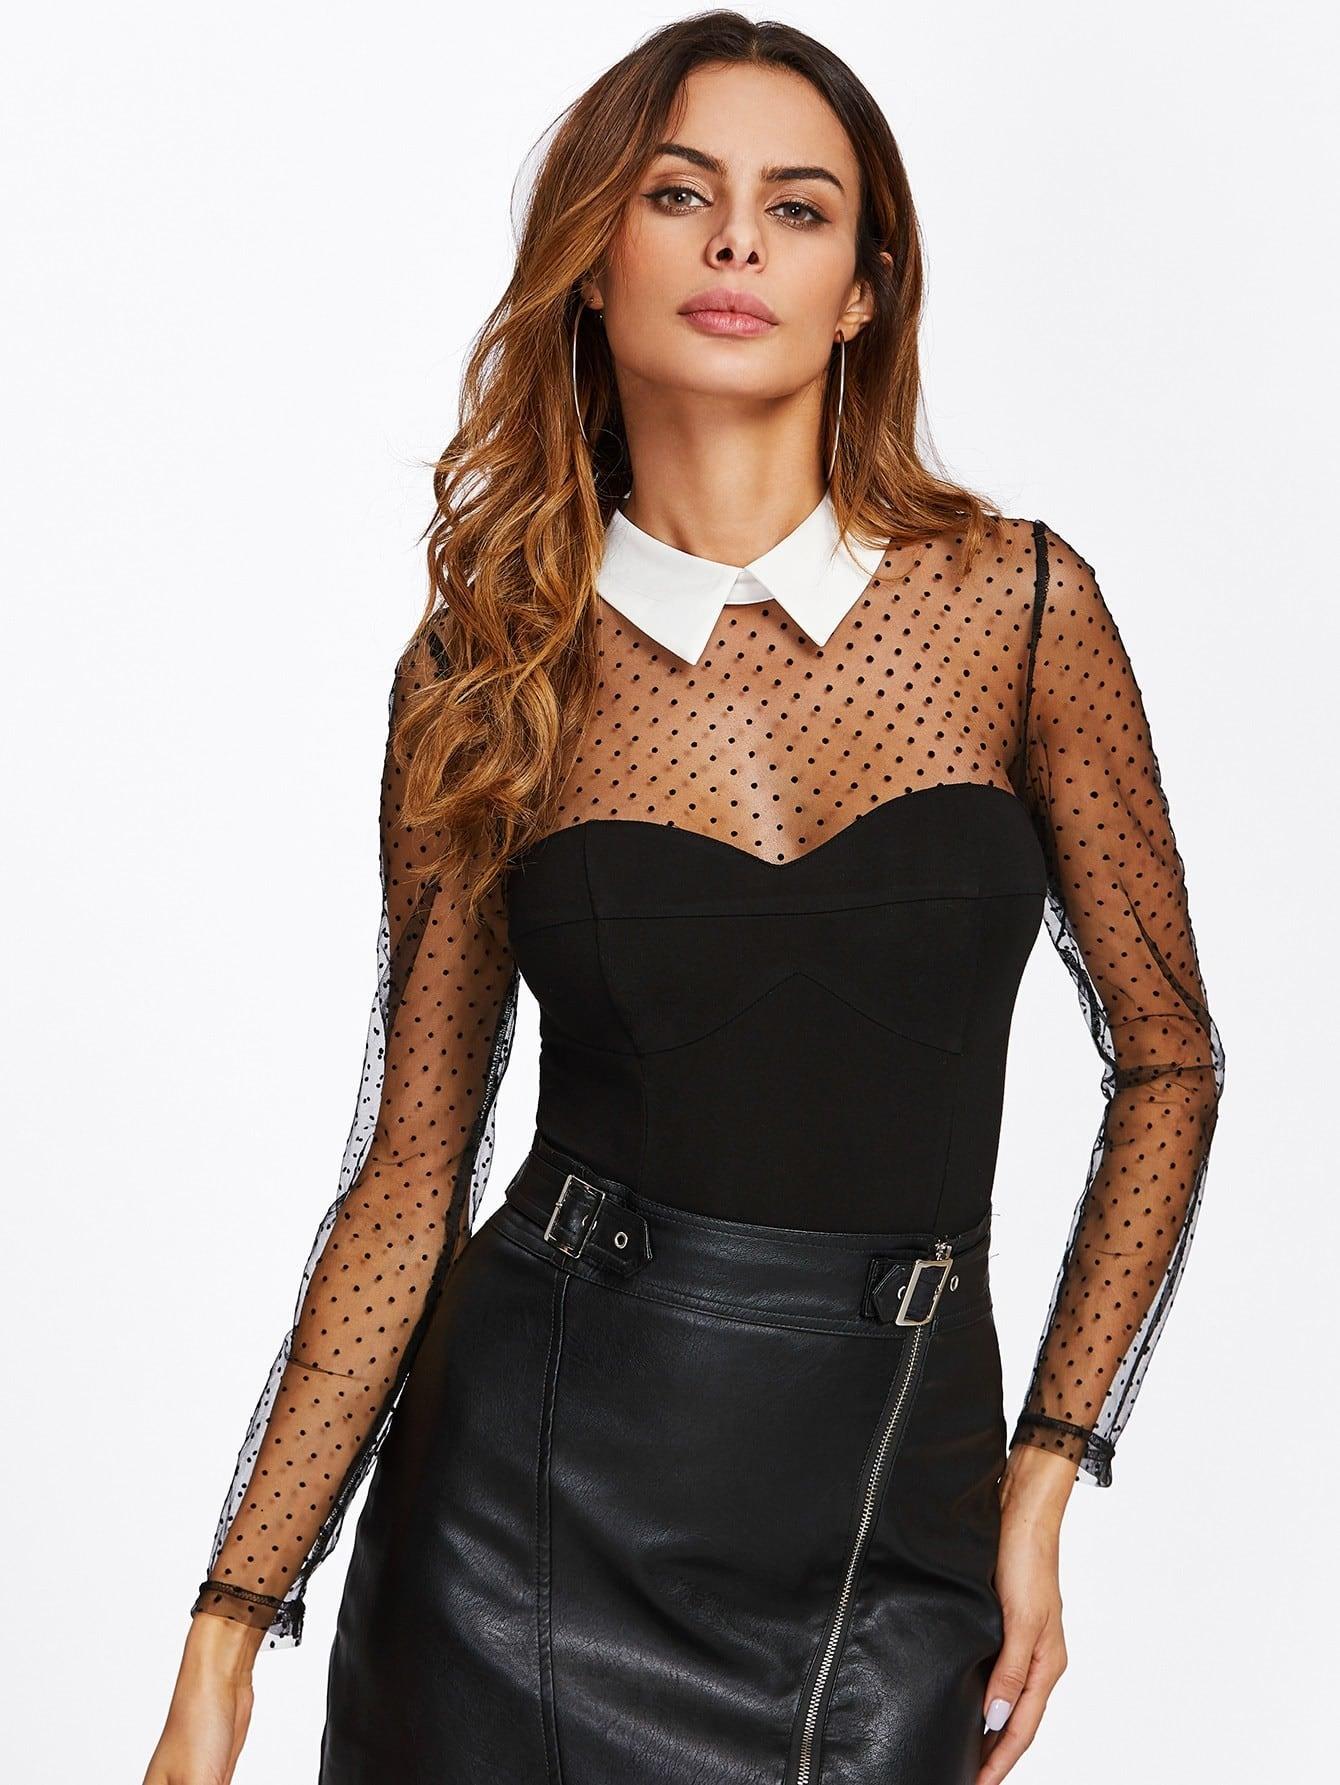 Dot Mesh Yoke And Sleeve Contrast Collar Bodysuit contrast dotted mesh bodysuit